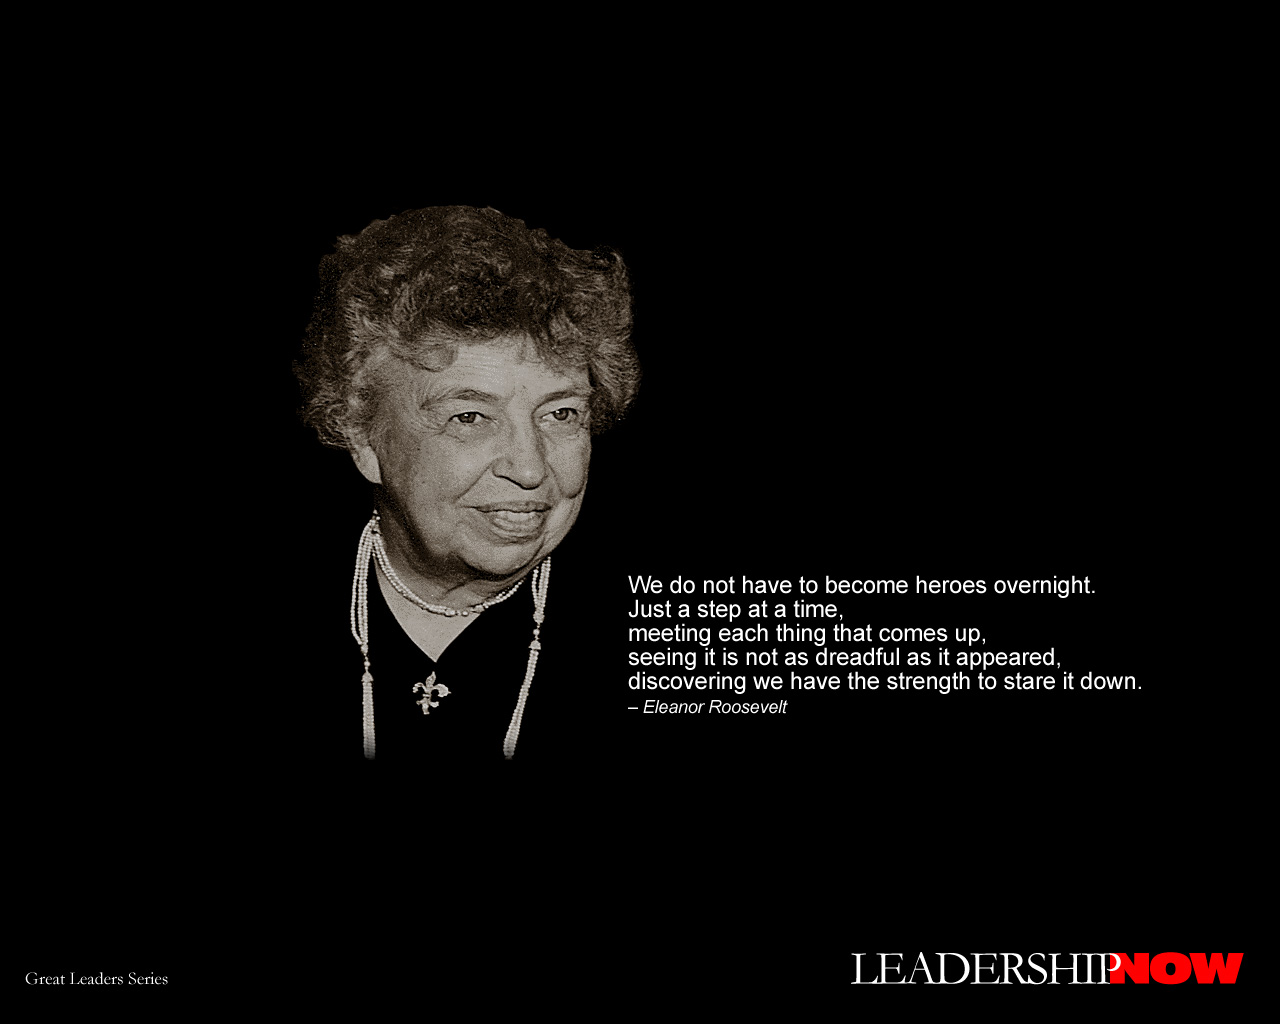 Eleanor Roosevelt Quote Wallpaper Consent Leadershipnow 187 Wallpapers 187 Downloads